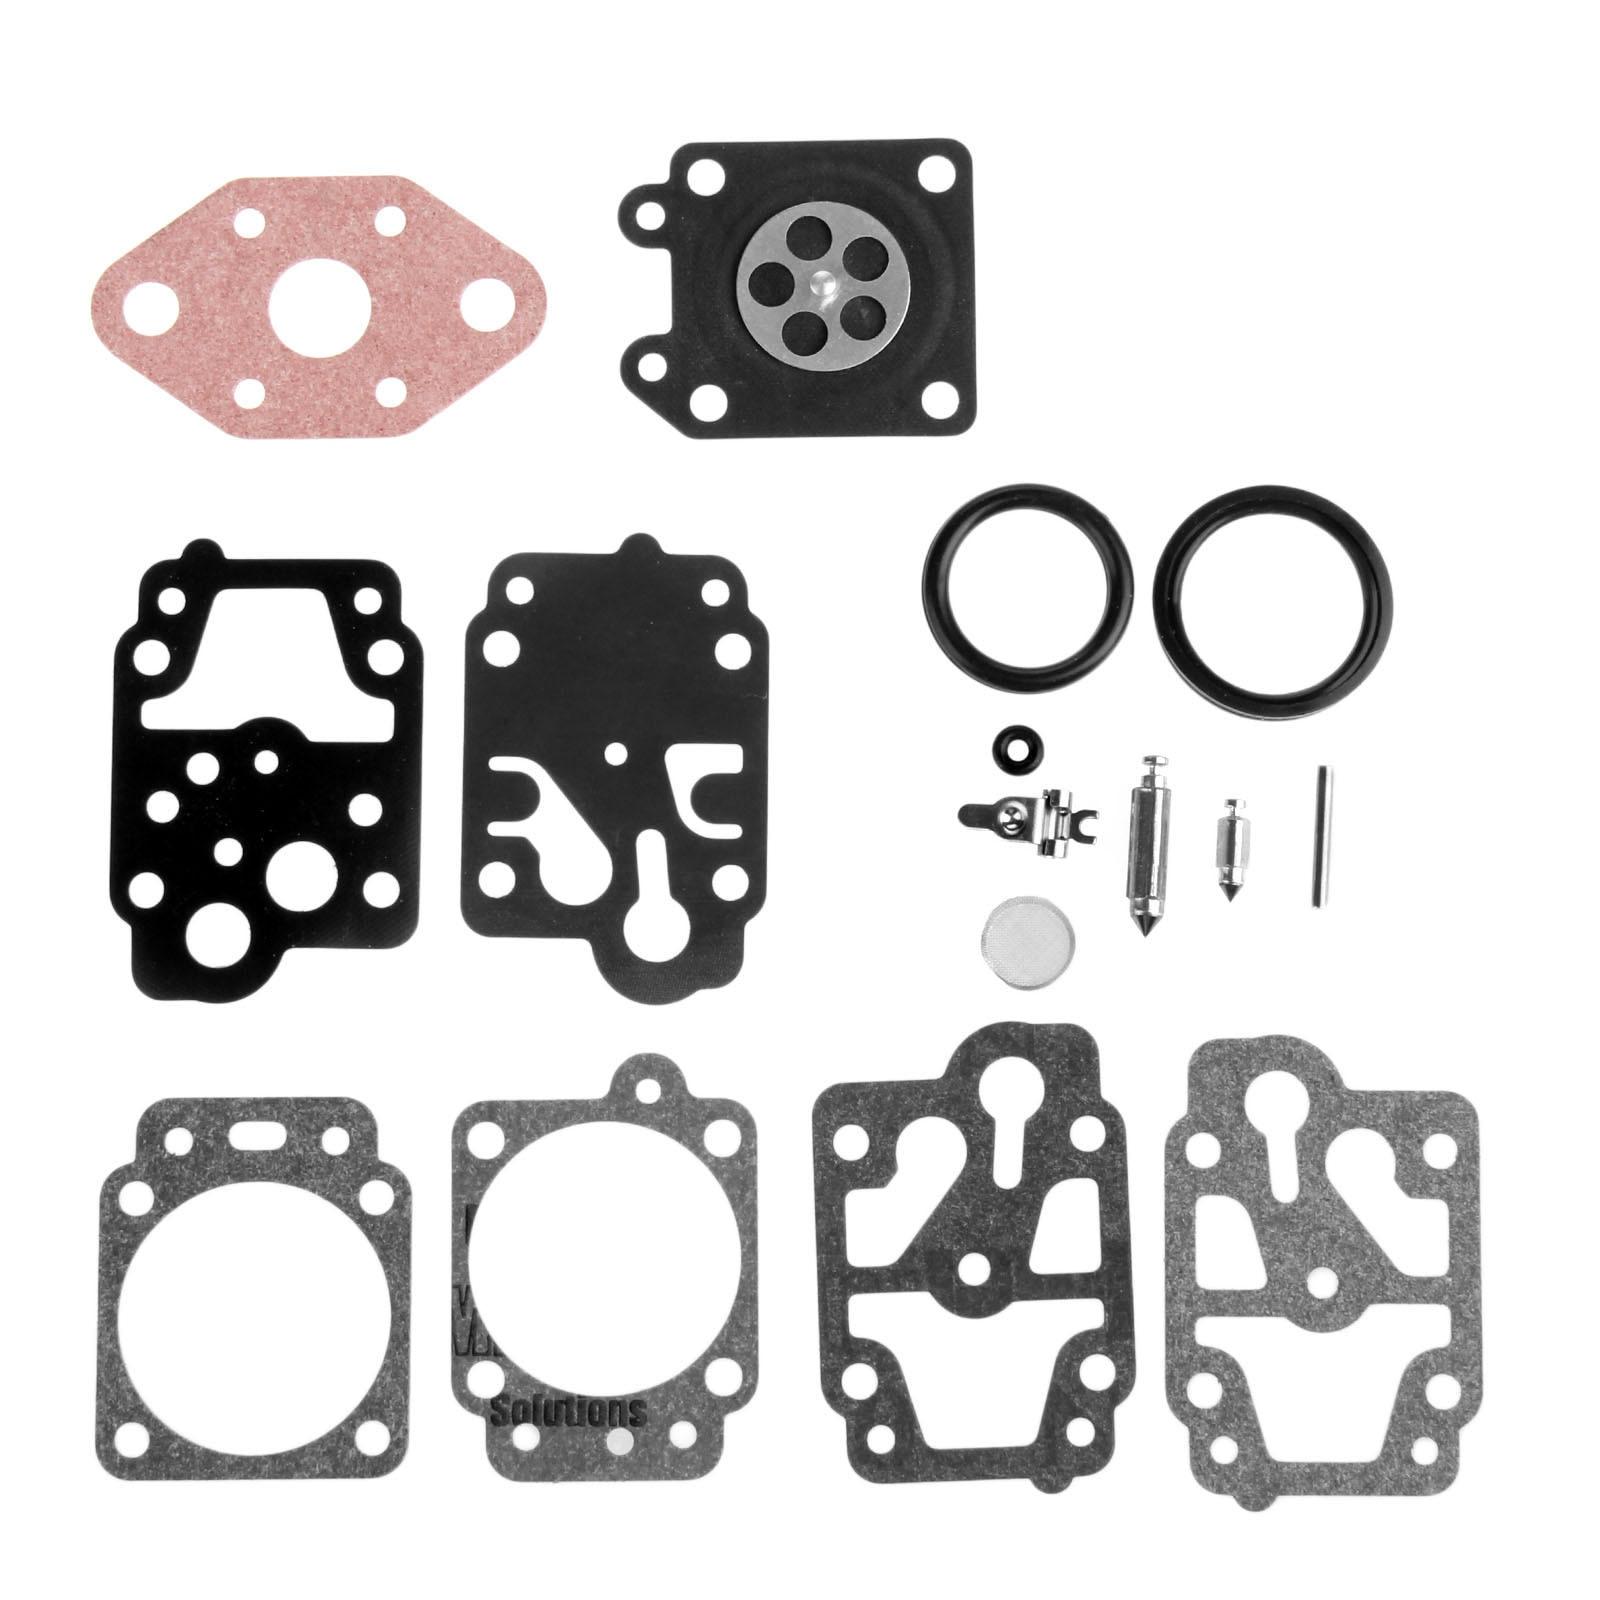 Dophee Carburetor Carb Repair Kit For WALBRO K20-WYL Echo Emak Kawasaki Komatsu Maruyama Mitsubishi Shindaiwa Chainsaw Parts